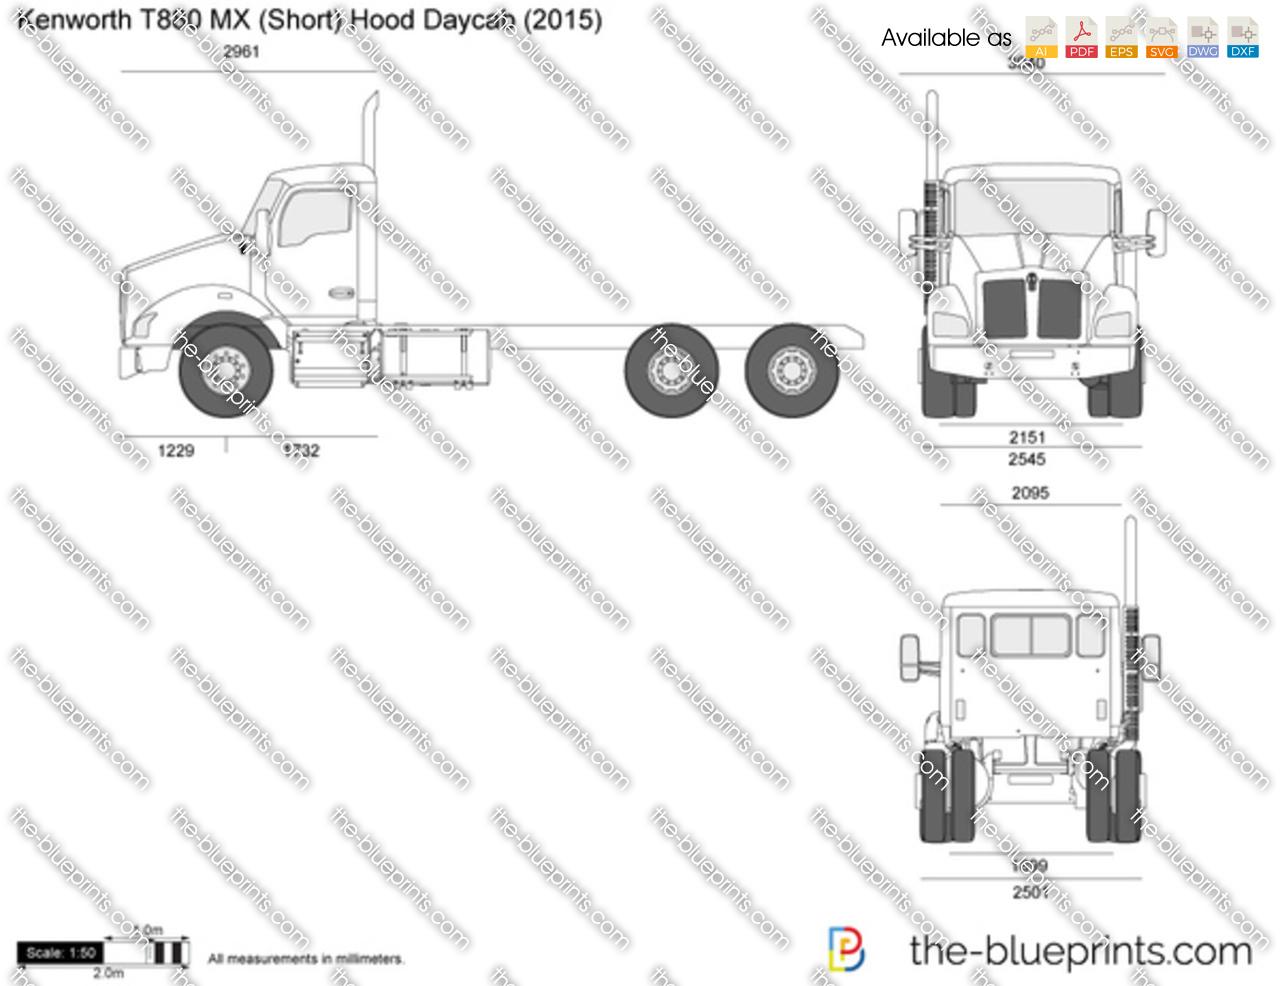 Kenworth T880 Mx Short Hood Daycab Vector Drawing